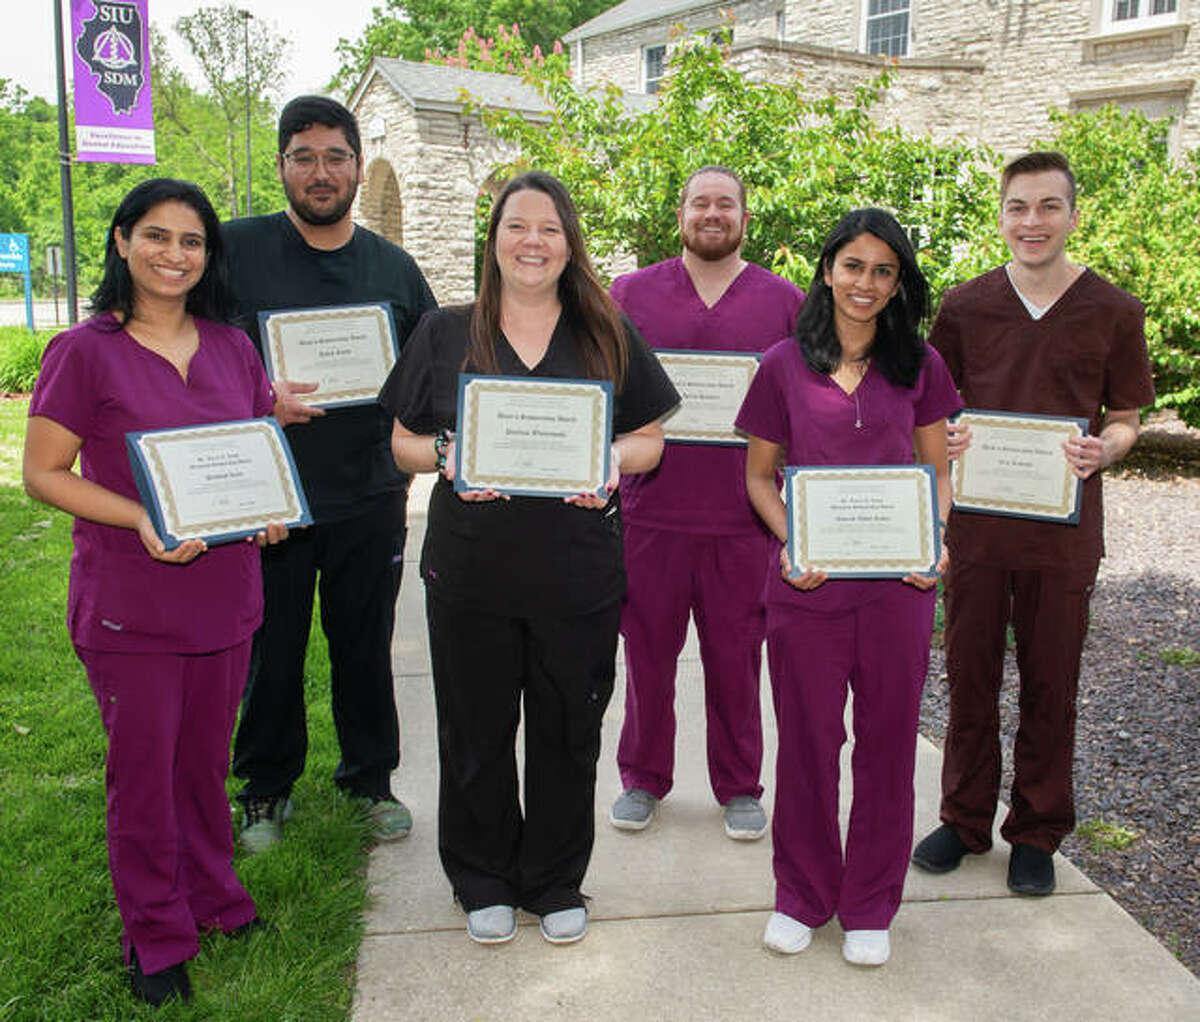 Southern Illinois University School of Dental Medicine scholarship recipients, left to right, Prabhjot Kaur, Kevin Kordi, Paulina Wisniewska, Dylan Handlin, Nourah Abdul Kader and Eric Kubacki.